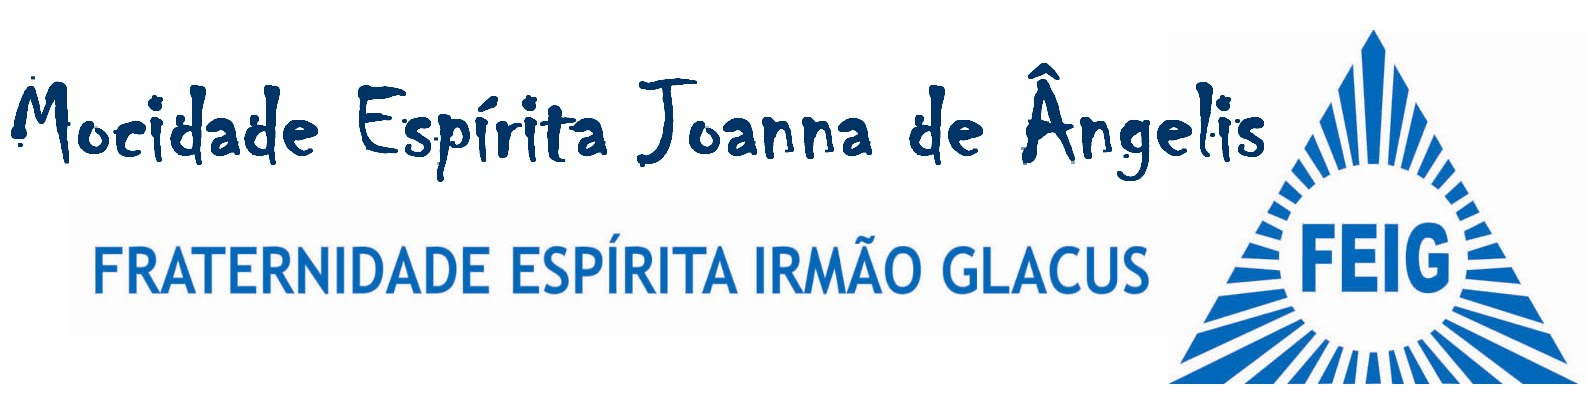 Mocidade Espírita Joanna de Ângelis